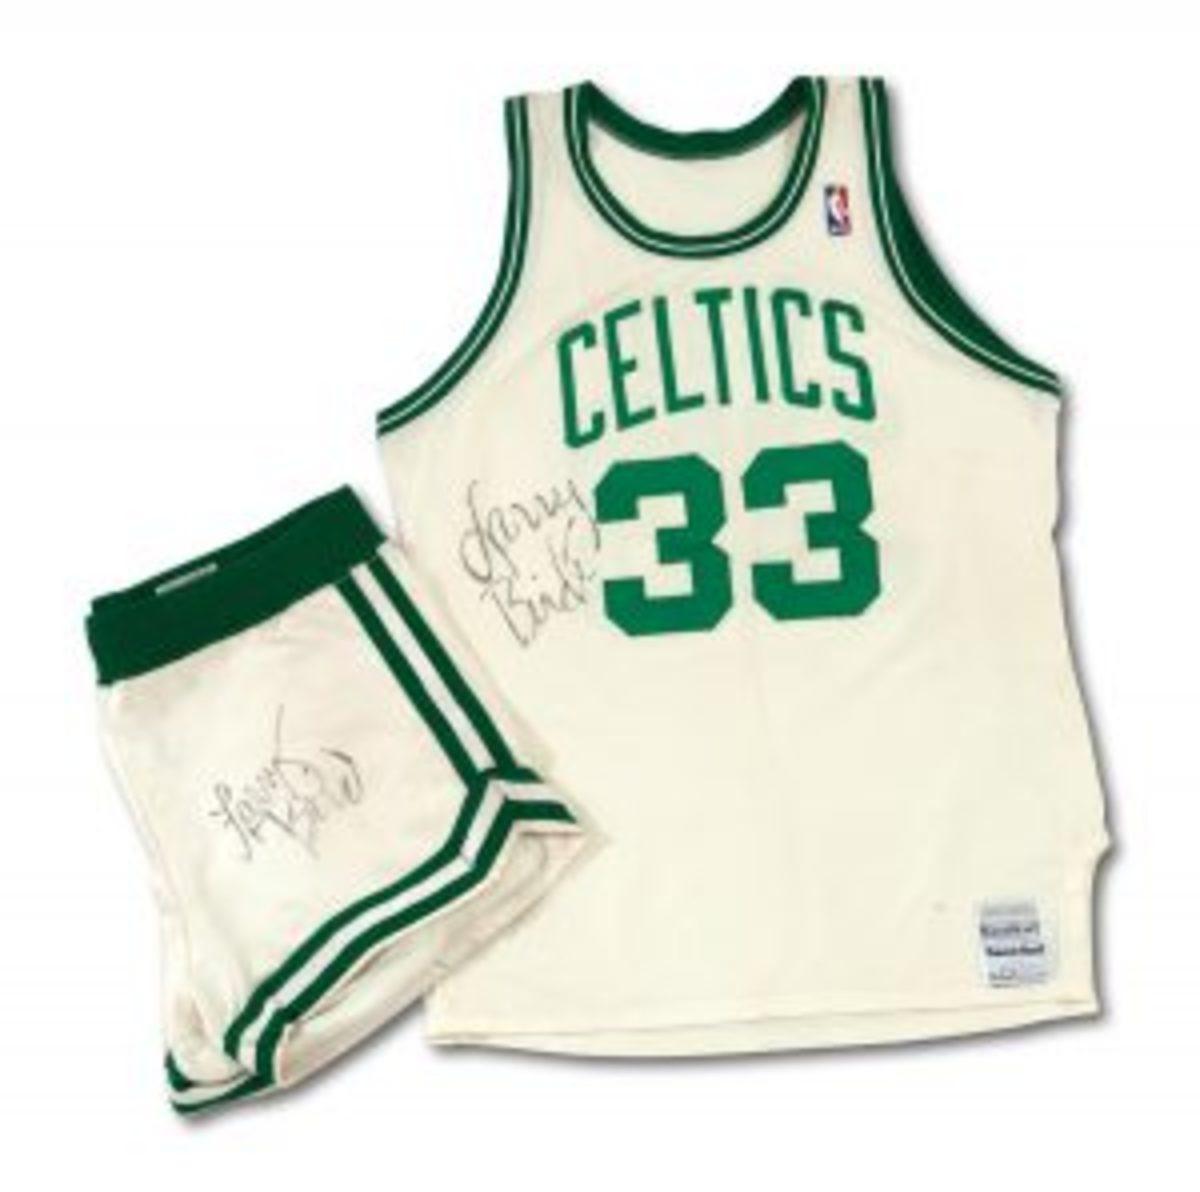 Larry Bird's 1986-87 Signed, Game-Worn Celtics Uniform